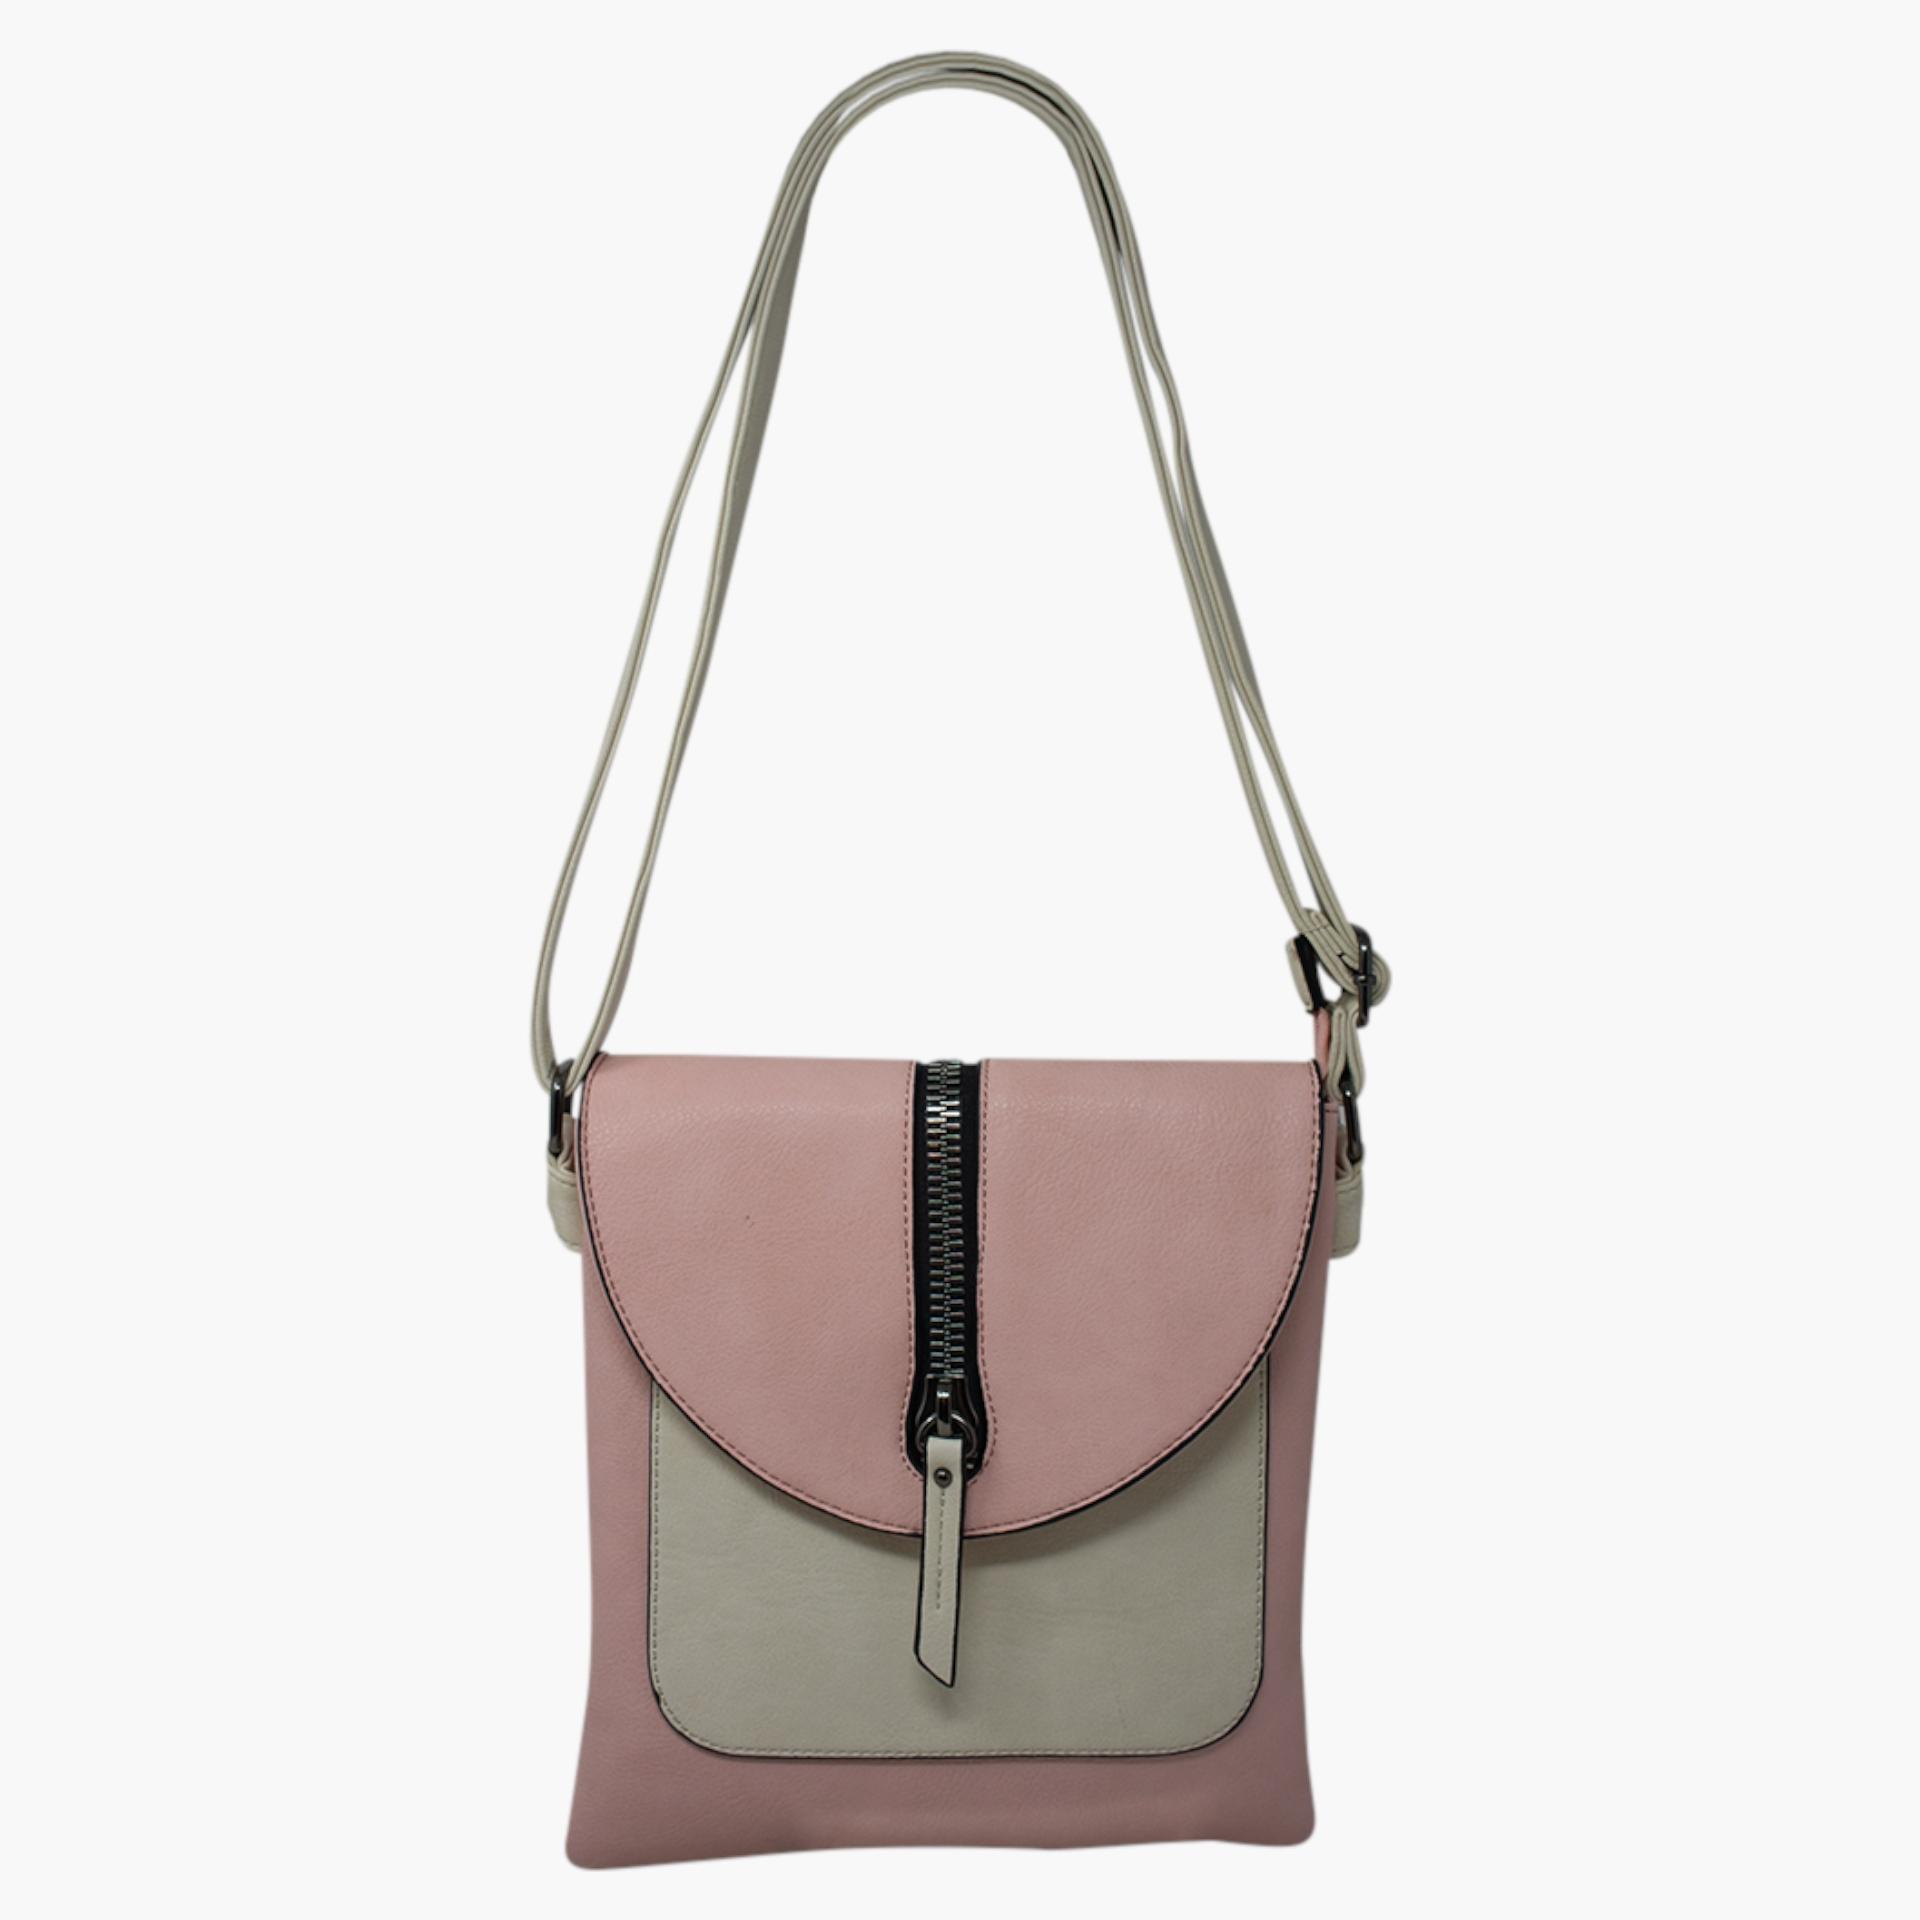 Cross Body Bag with Zip Detail - Pink/Cream